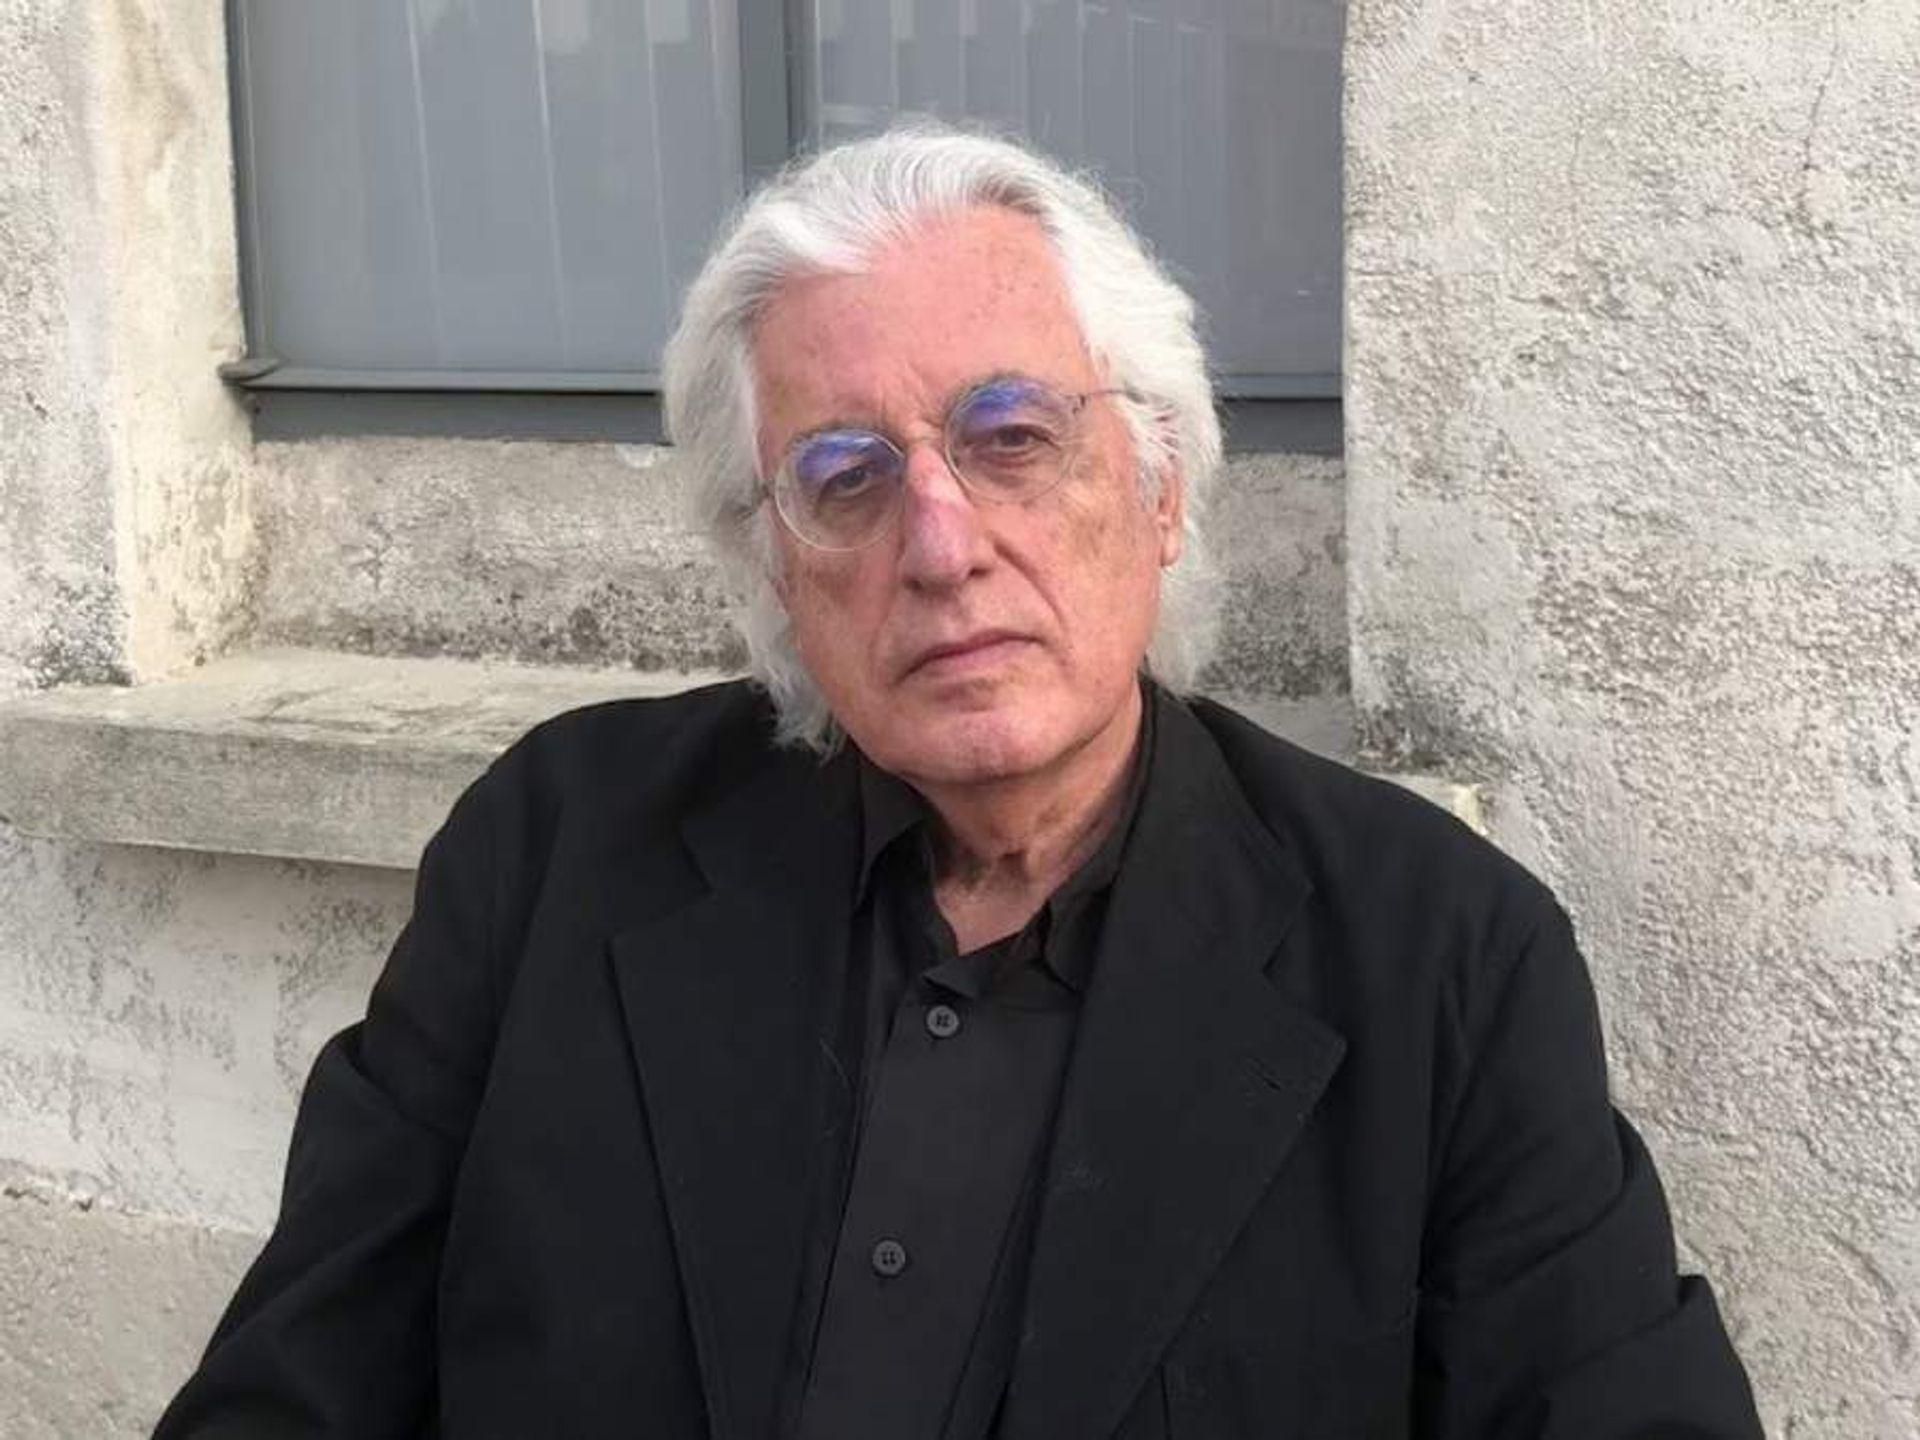 Germano Celant in 2018. Photo: Judith Benhamou-Huet via YouTube